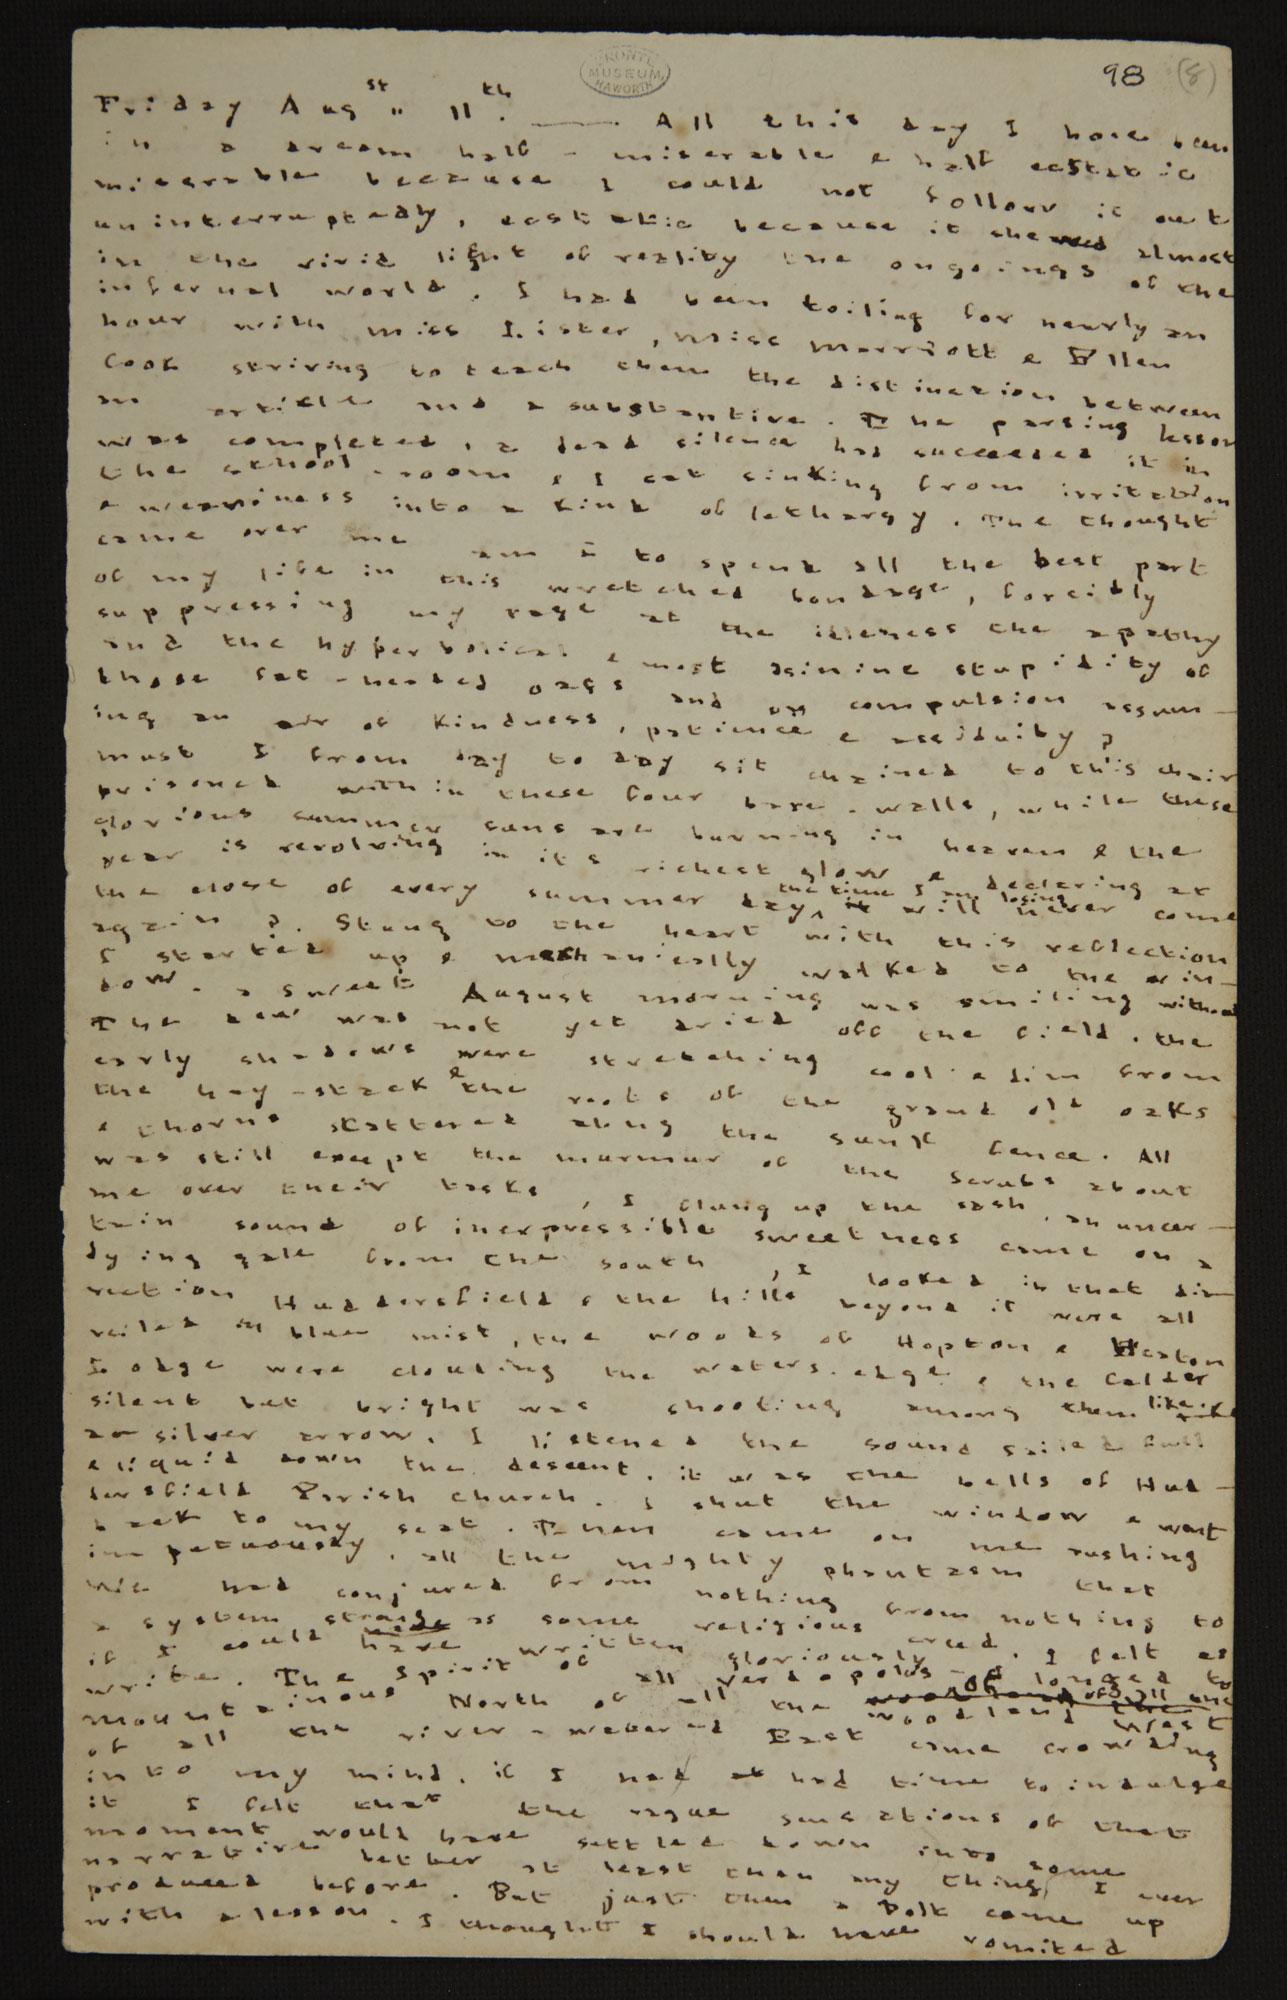 Charlotte Bronte's Journal [folio: 0]